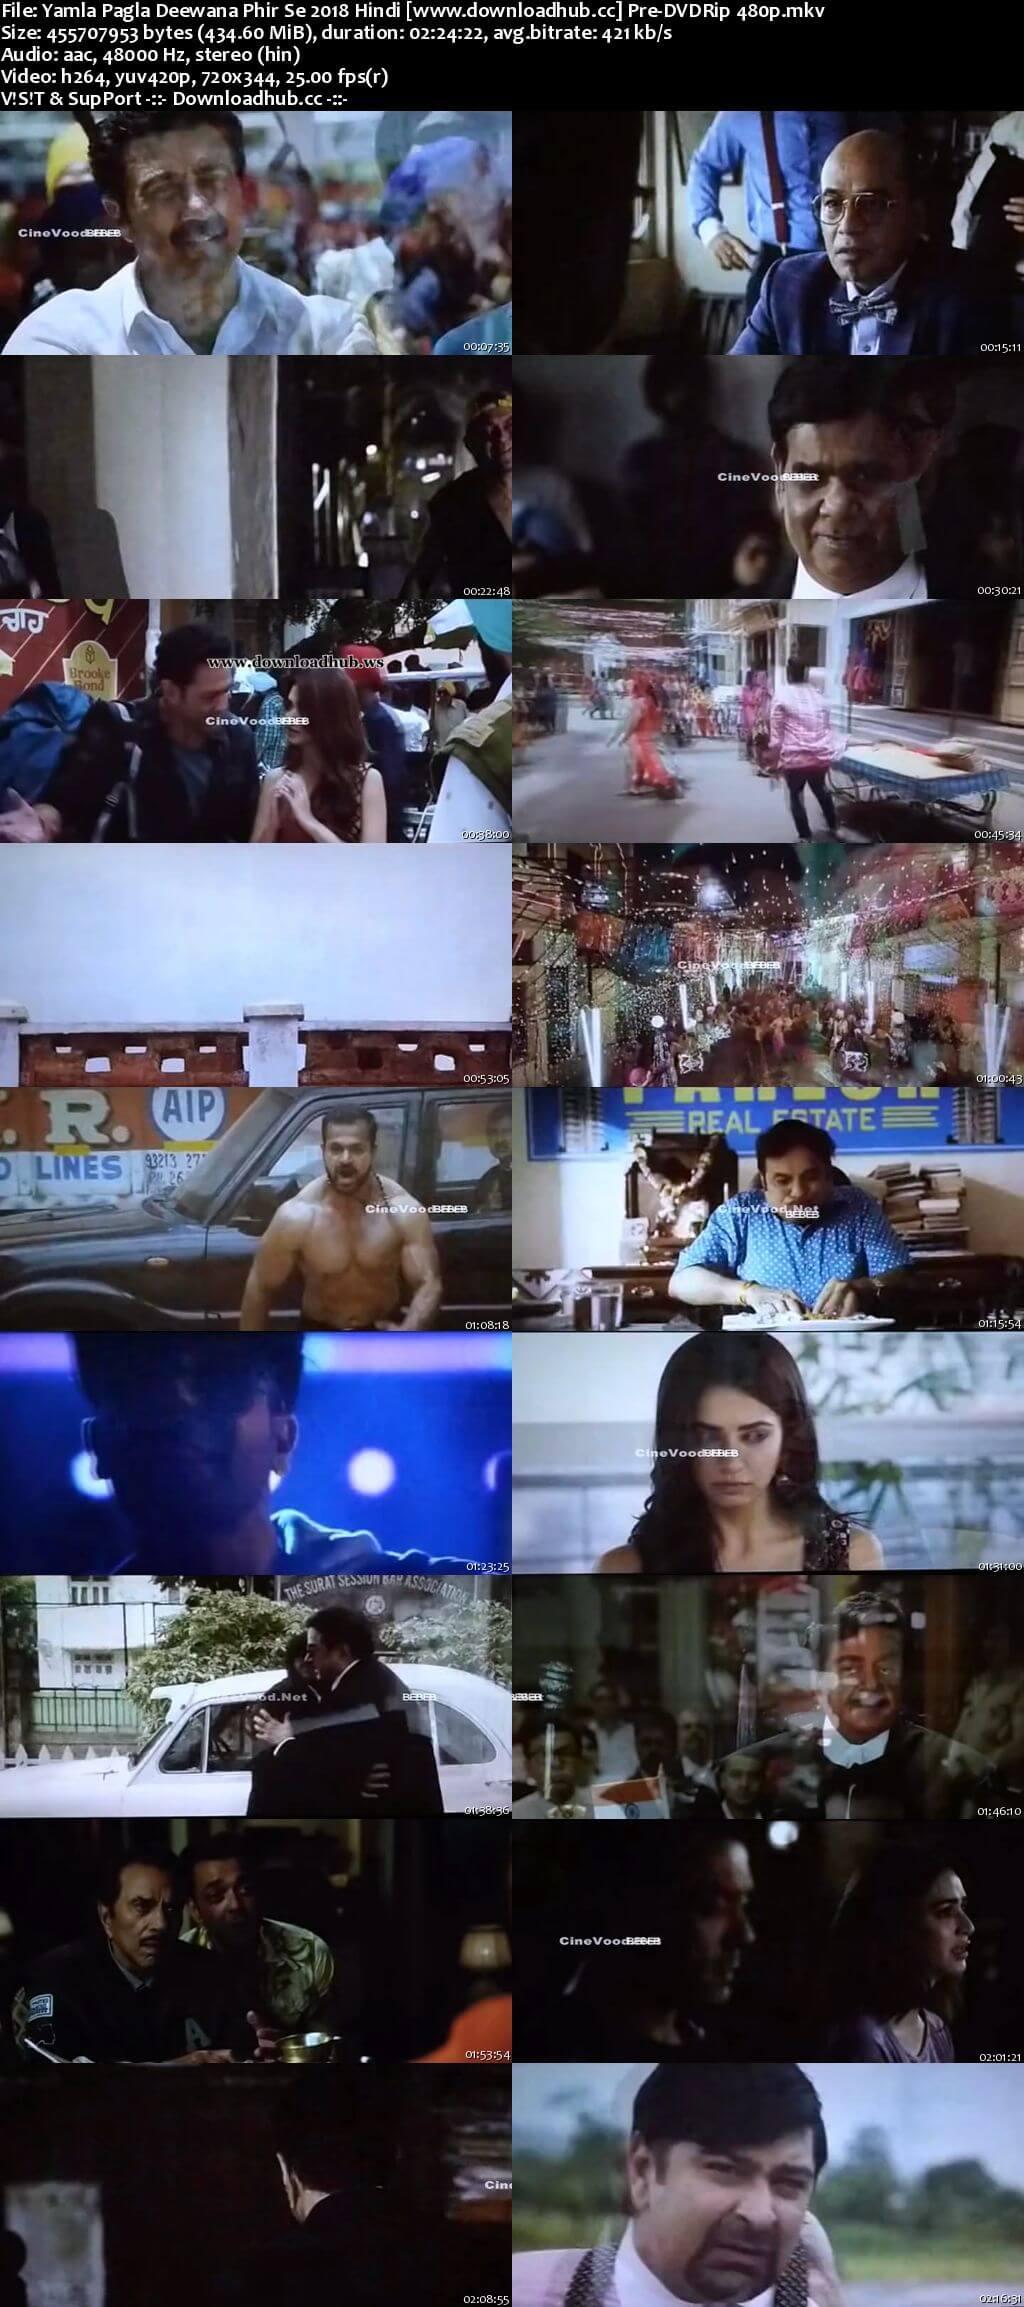 Yamla Pagla Deewana Phir Se 2018 Hindi 400MB Pre-DVDRip 480p